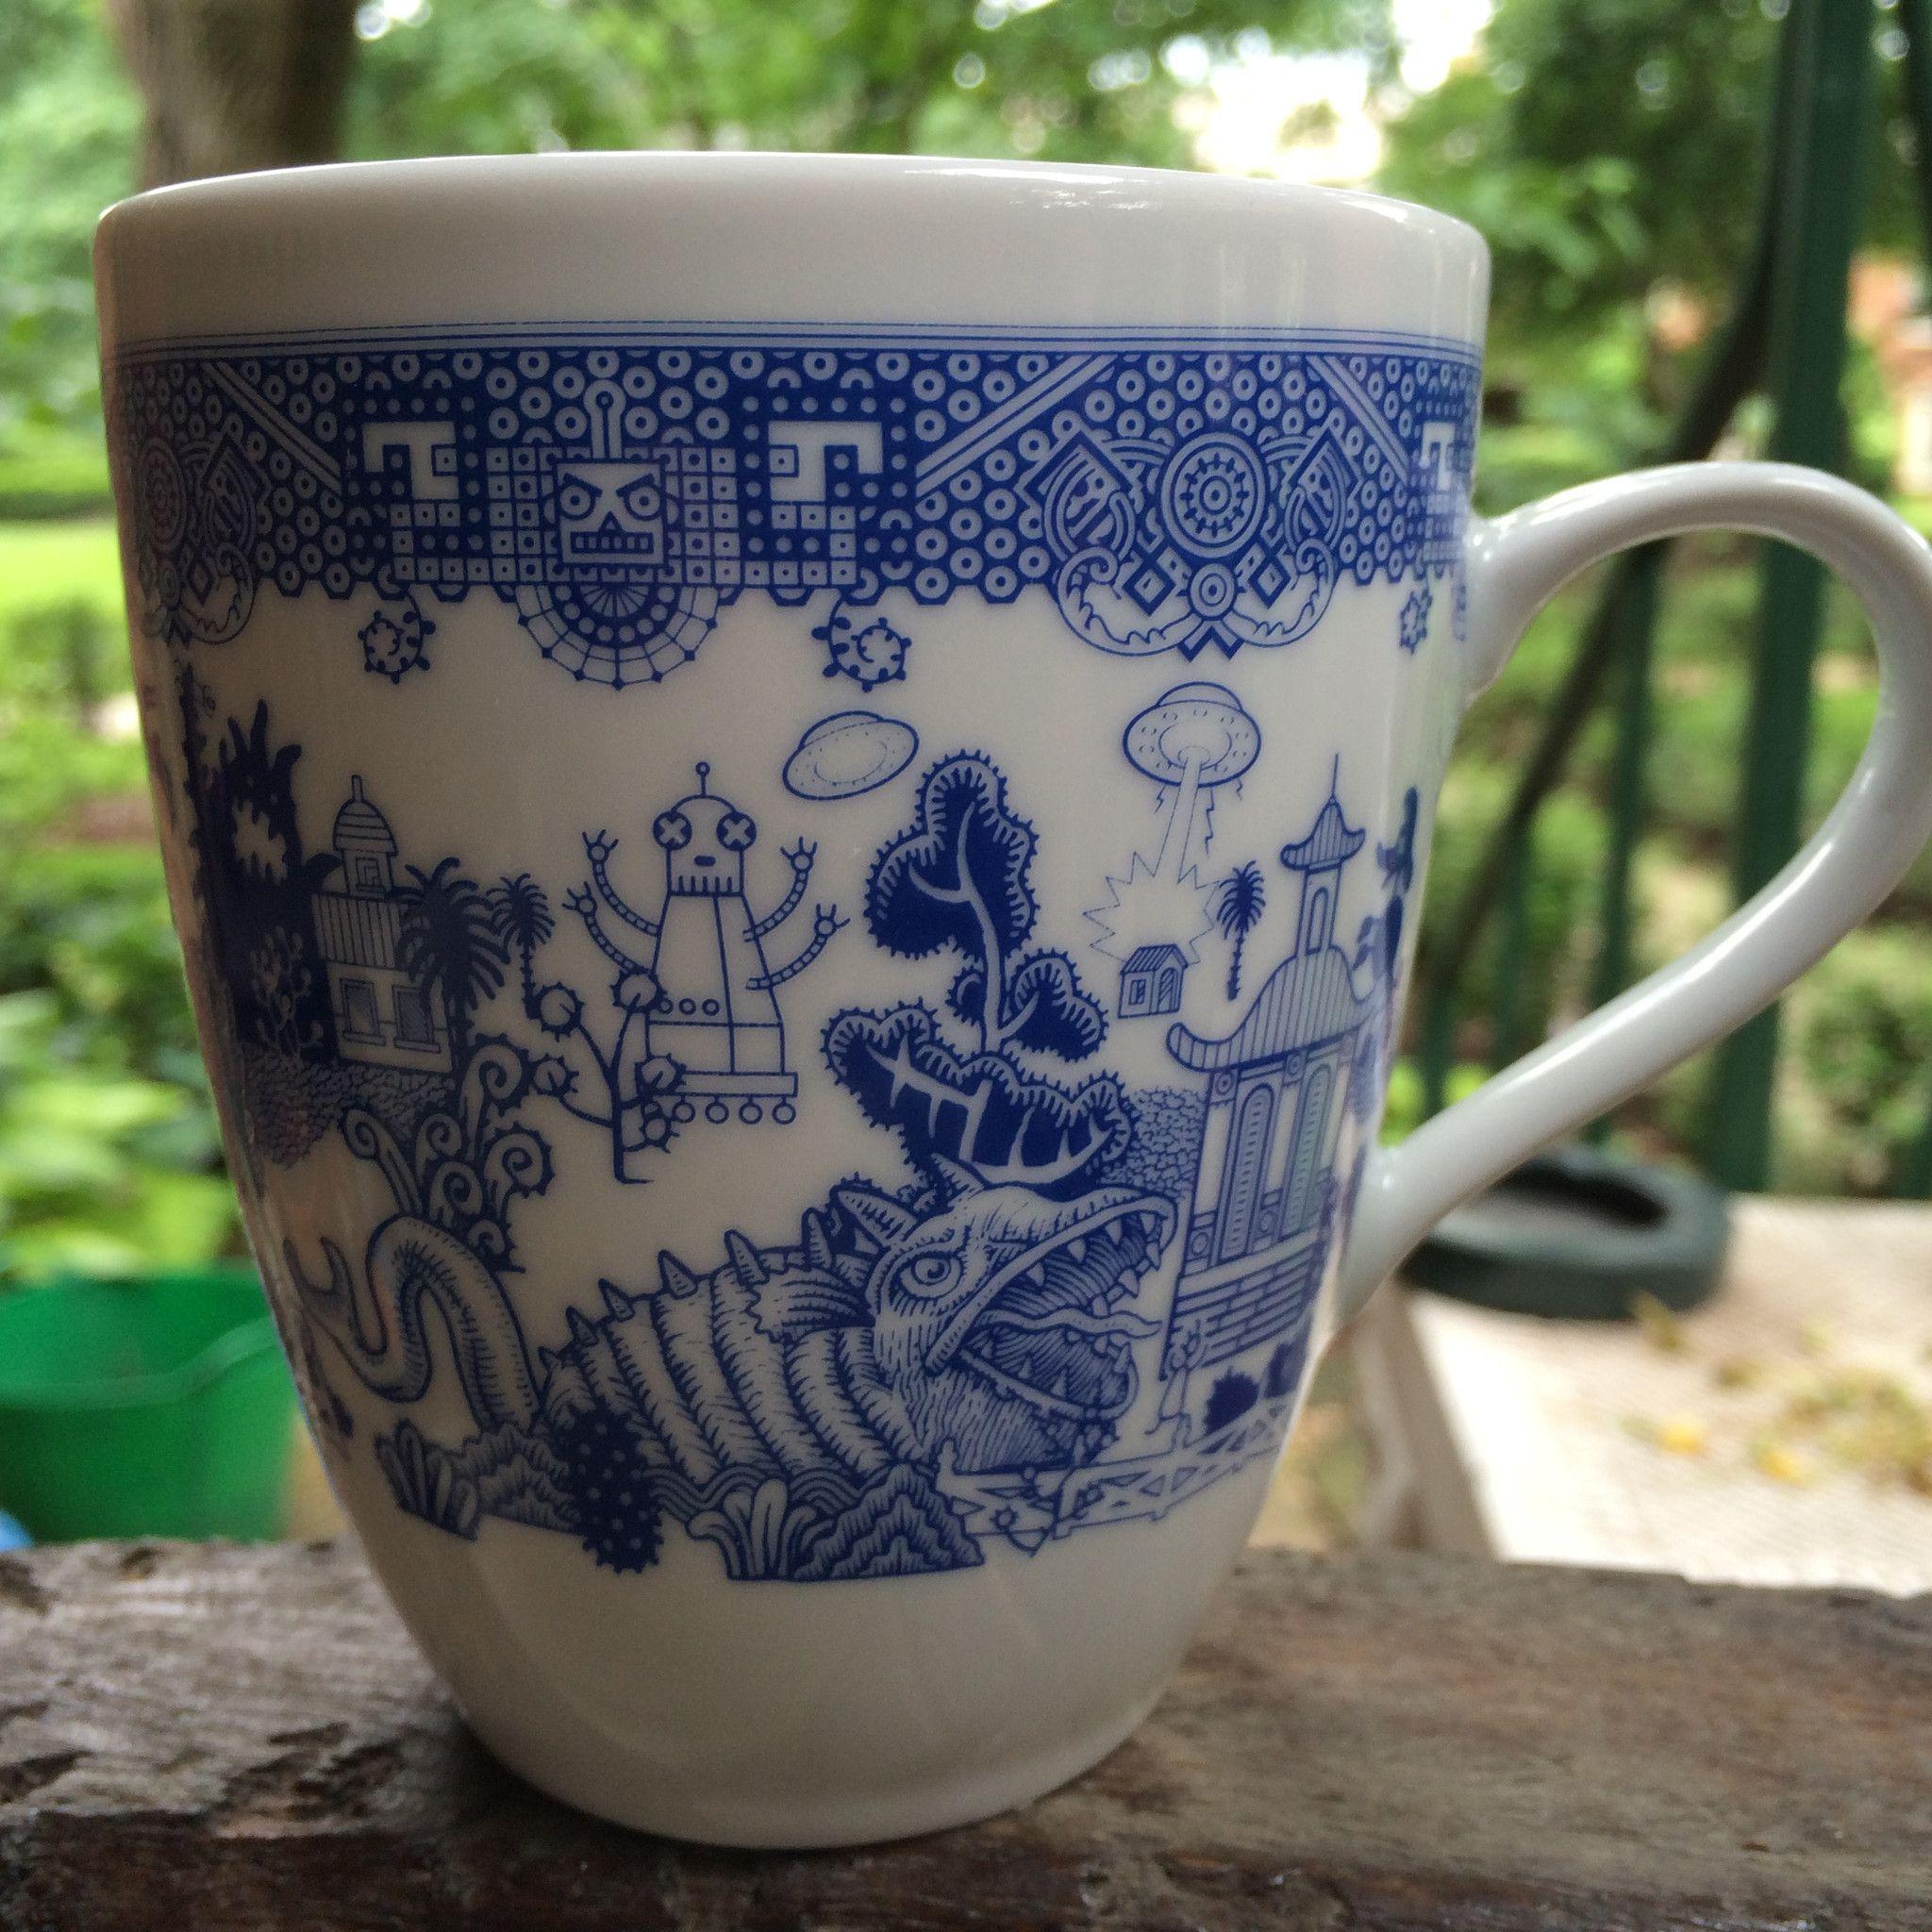 Calamityware Mugs Things Could Be Worse Mugs Porcelain Mugs Calamity